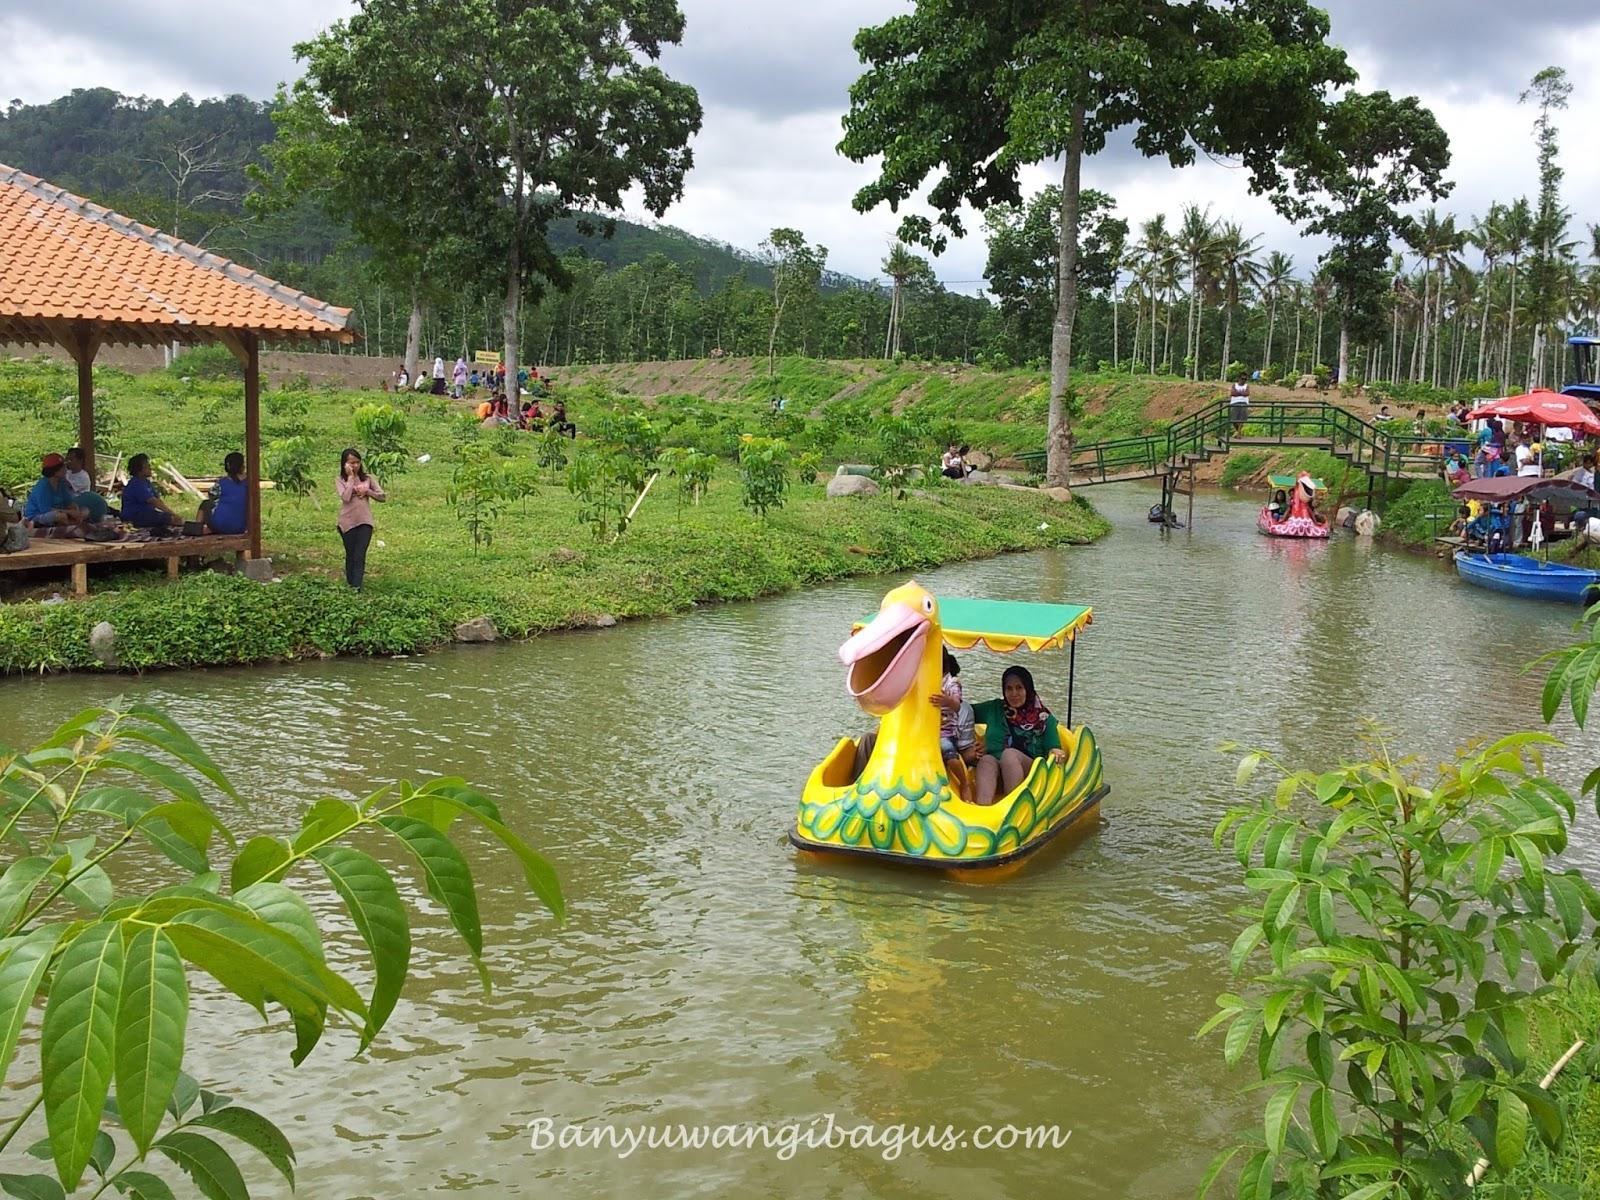 Tempat Wisata Banyuwangi Cocok Liburan 10 Waduk Sidodadi Glenmore Umbul